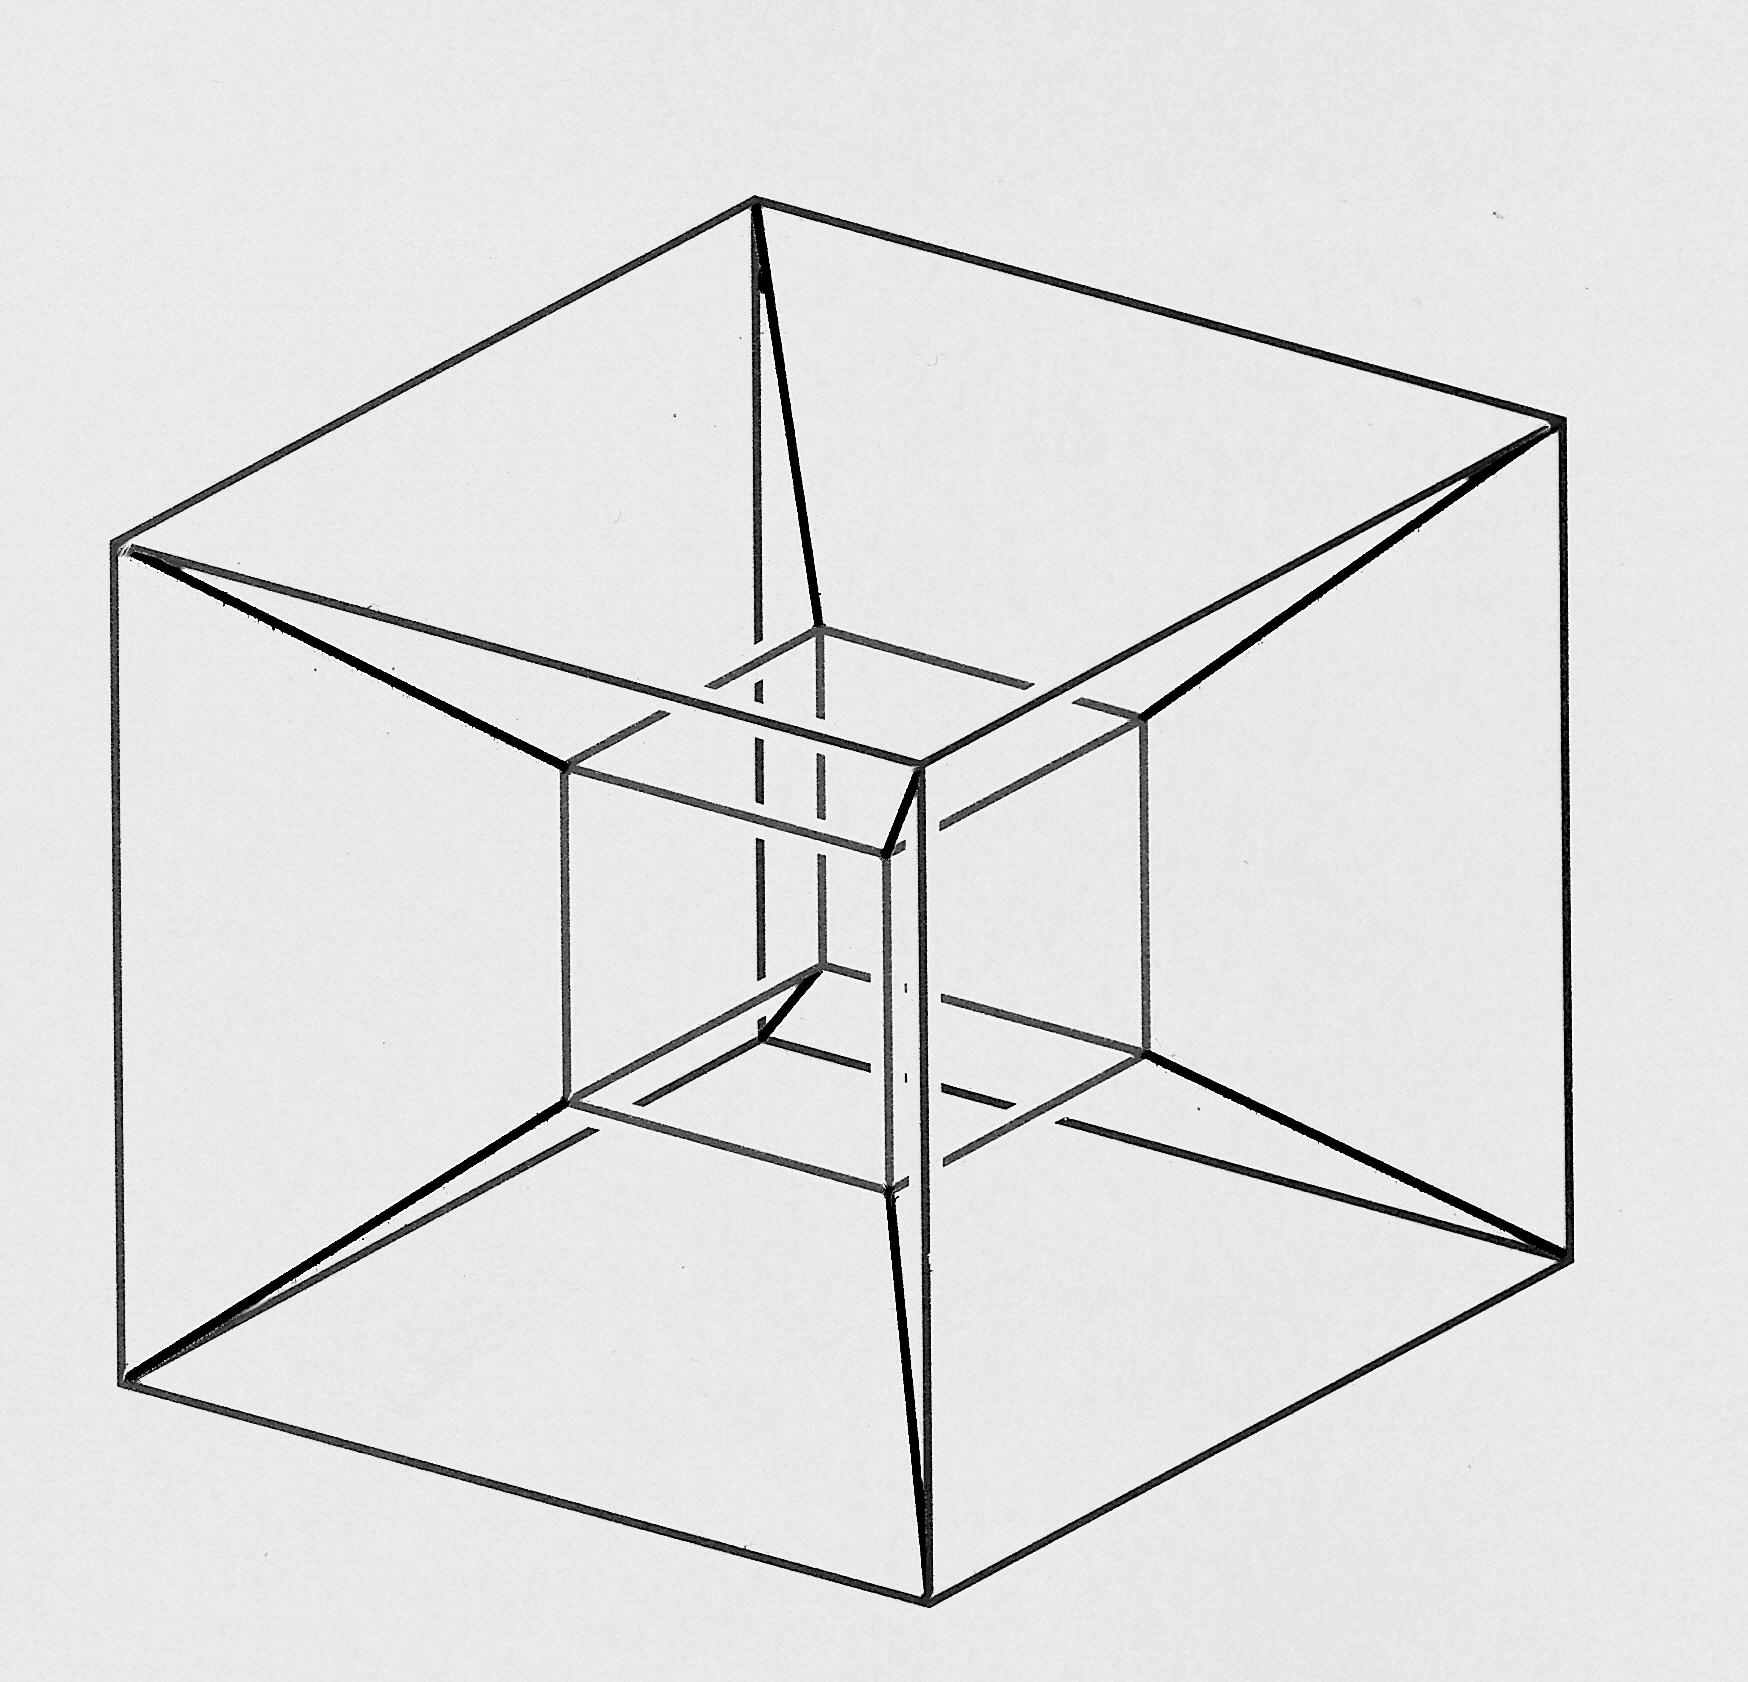 Hipercubo visualizando la cuarta dimensin  Cuaderno de Cultura